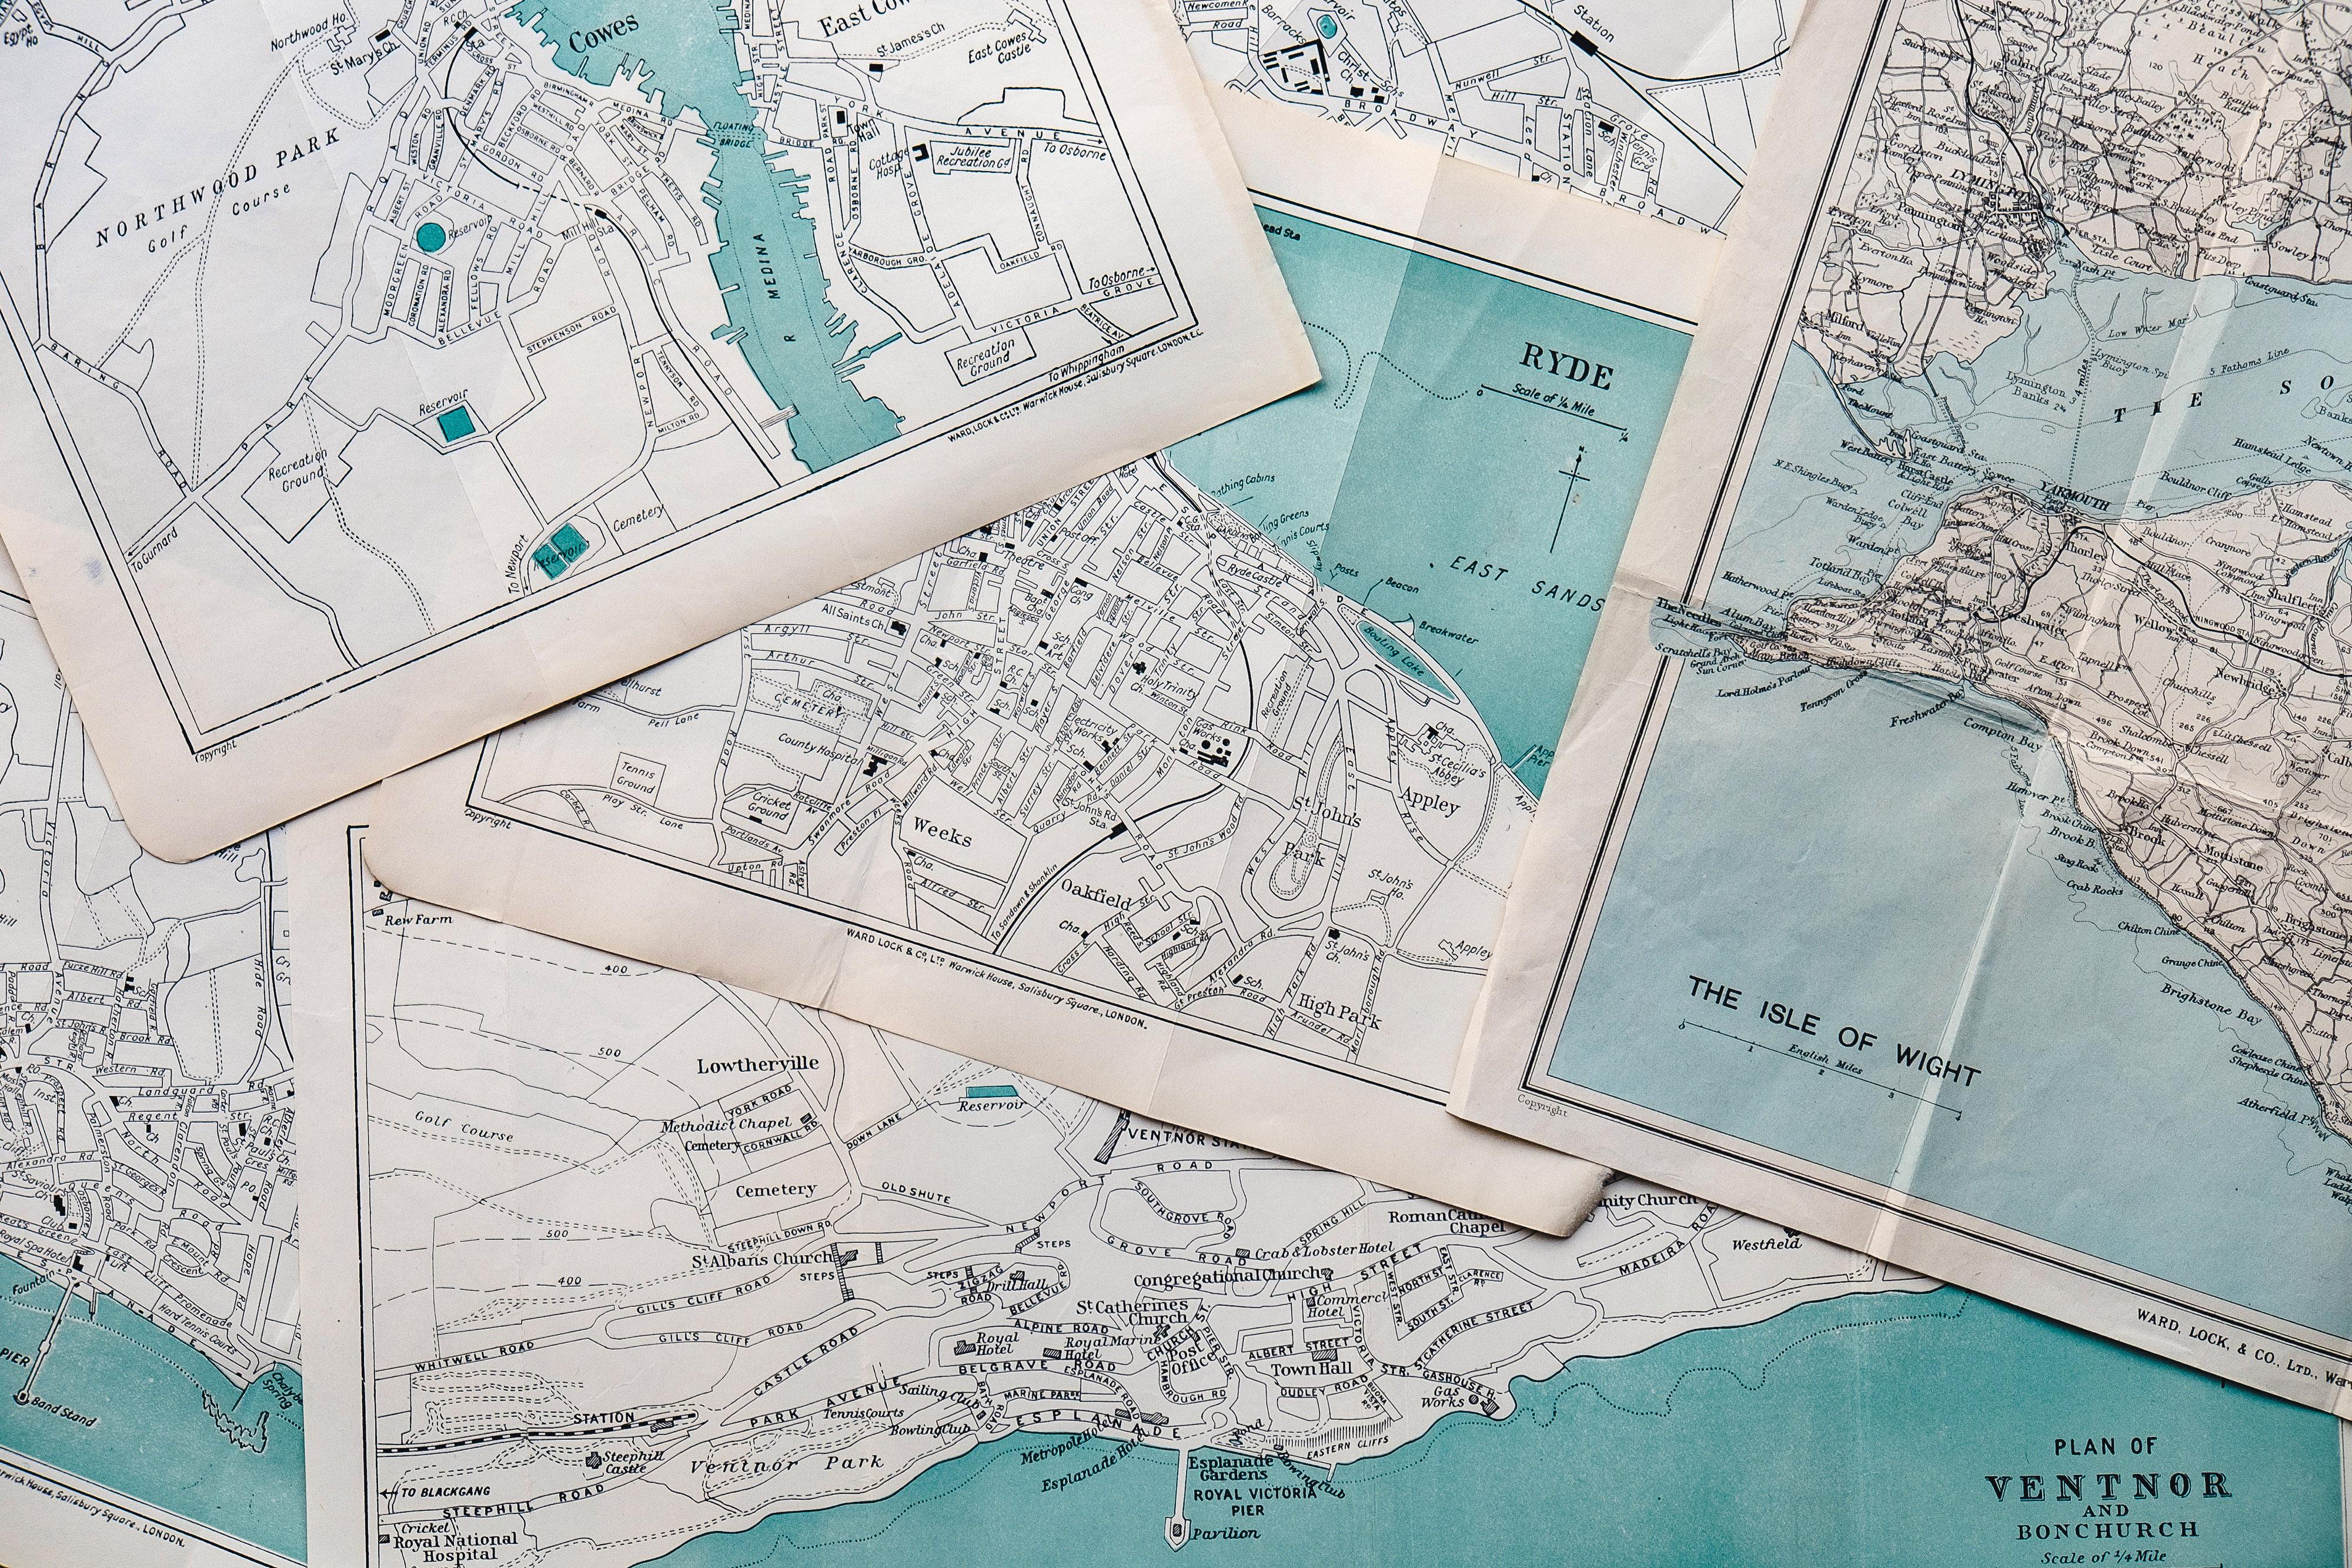 vintage maps image free stock photo public domain photo cc0 images